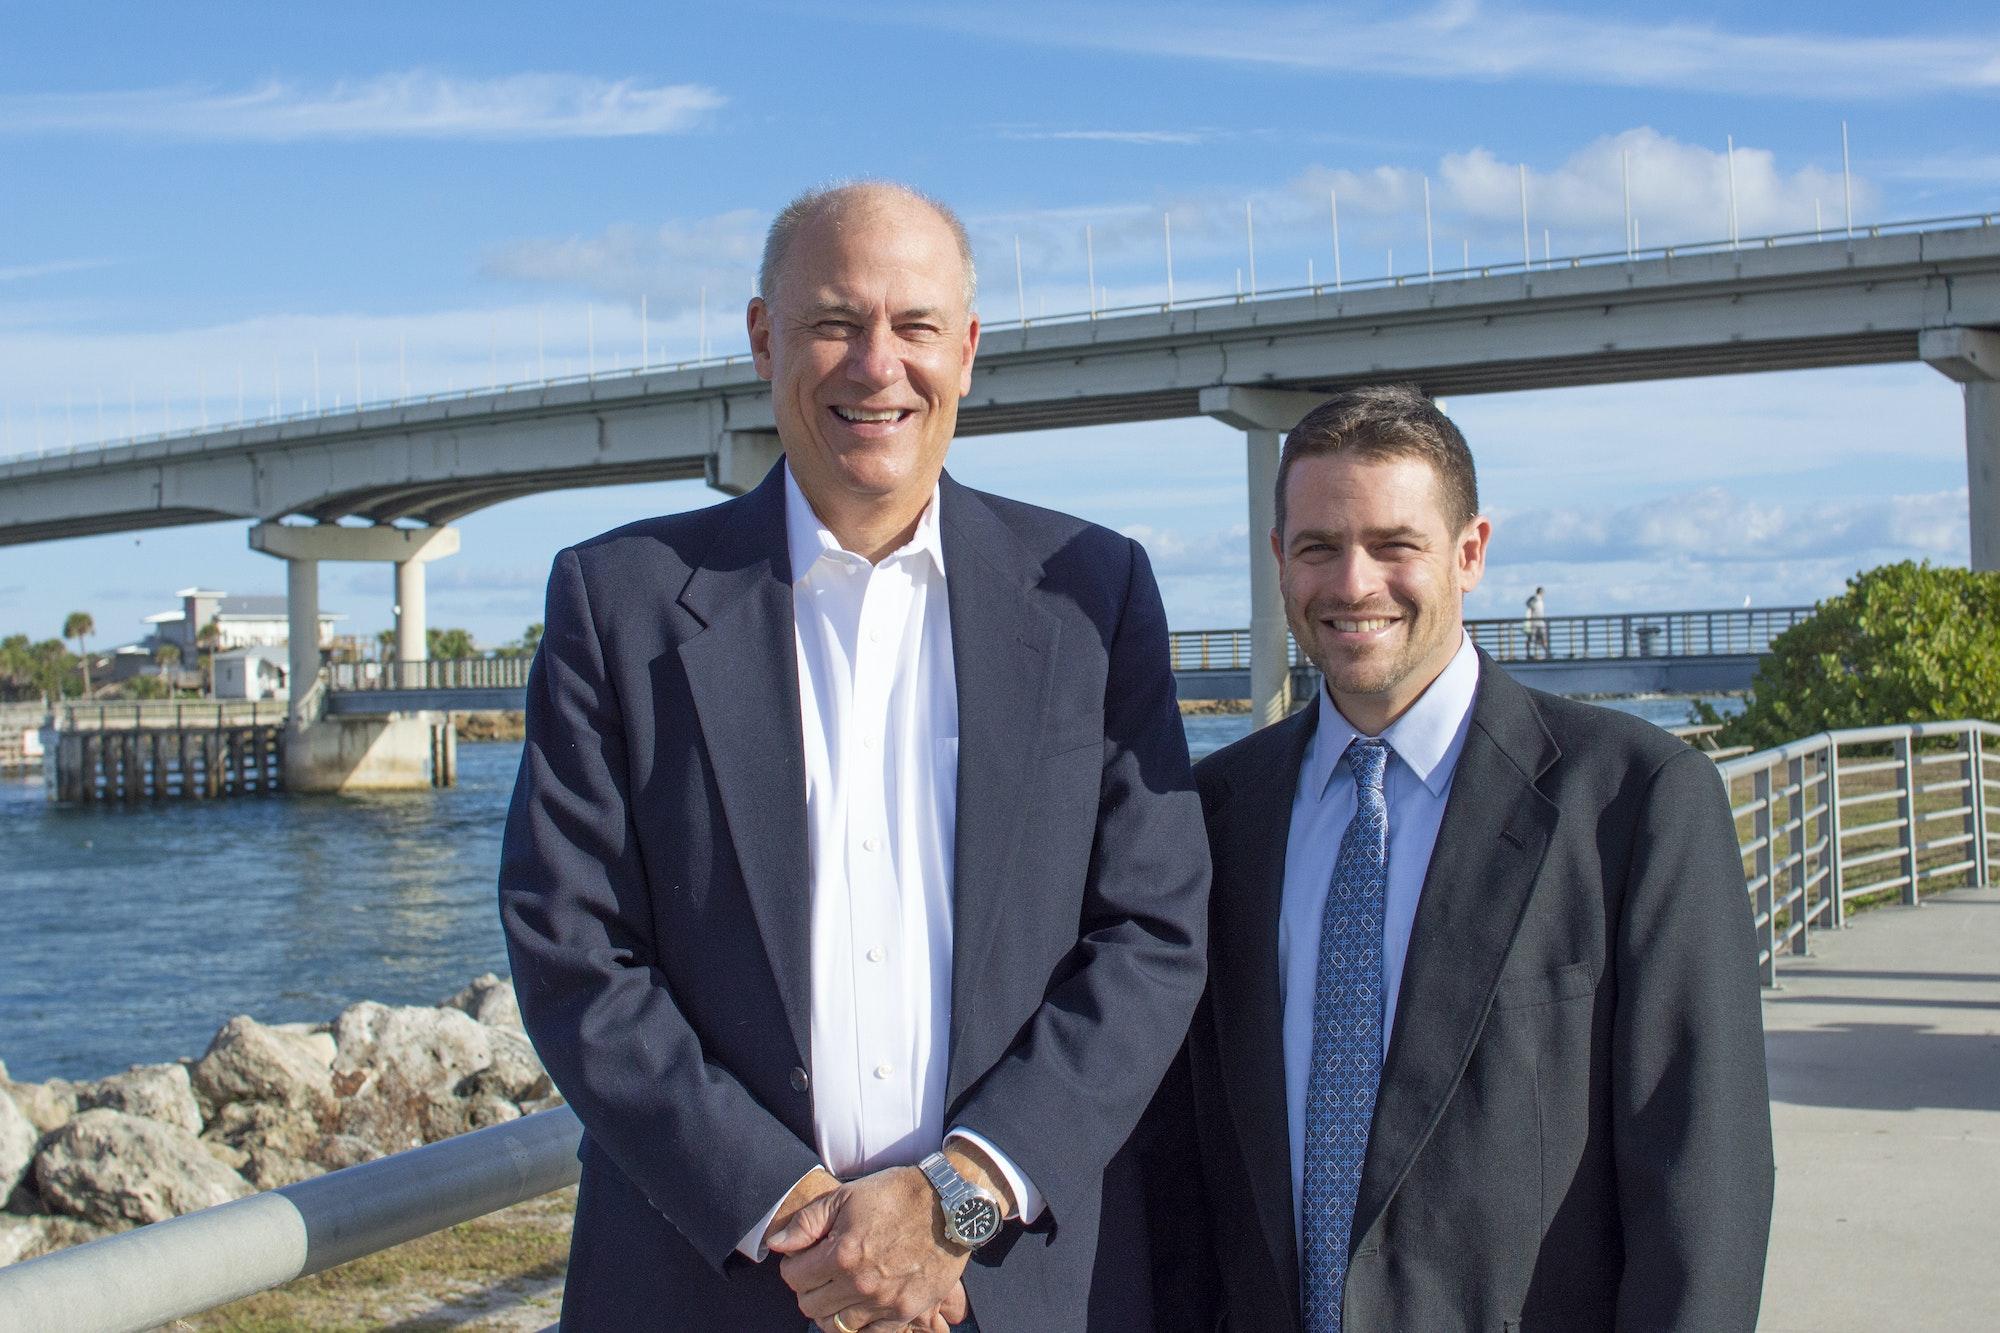 two men standing in front of bridge over inlet in background